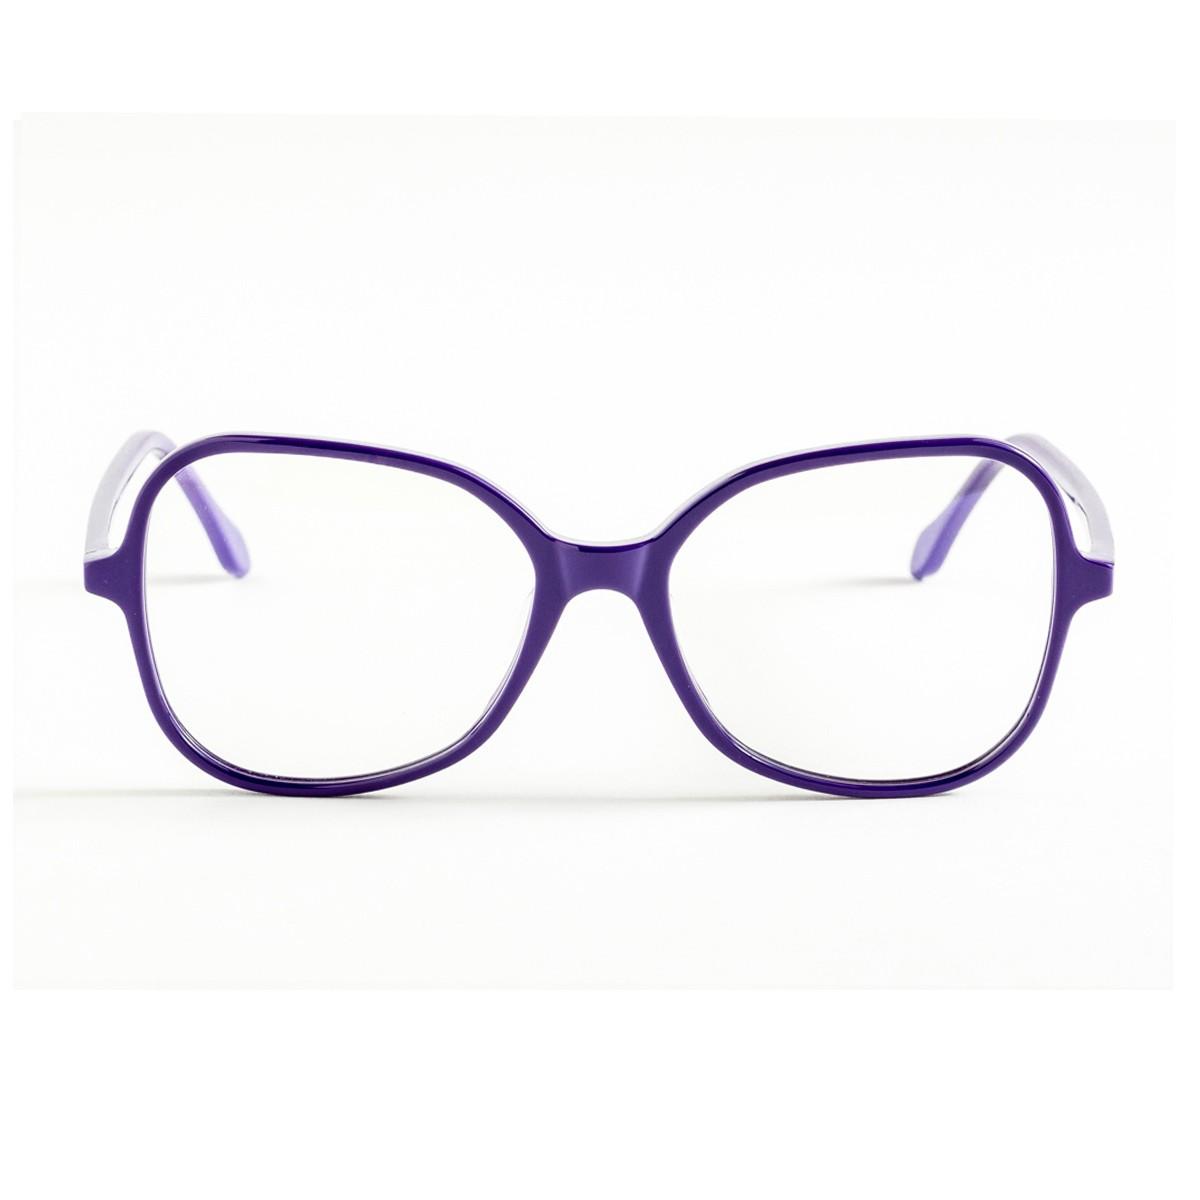 Germano Gambini GG113 | Women's eyeglasses